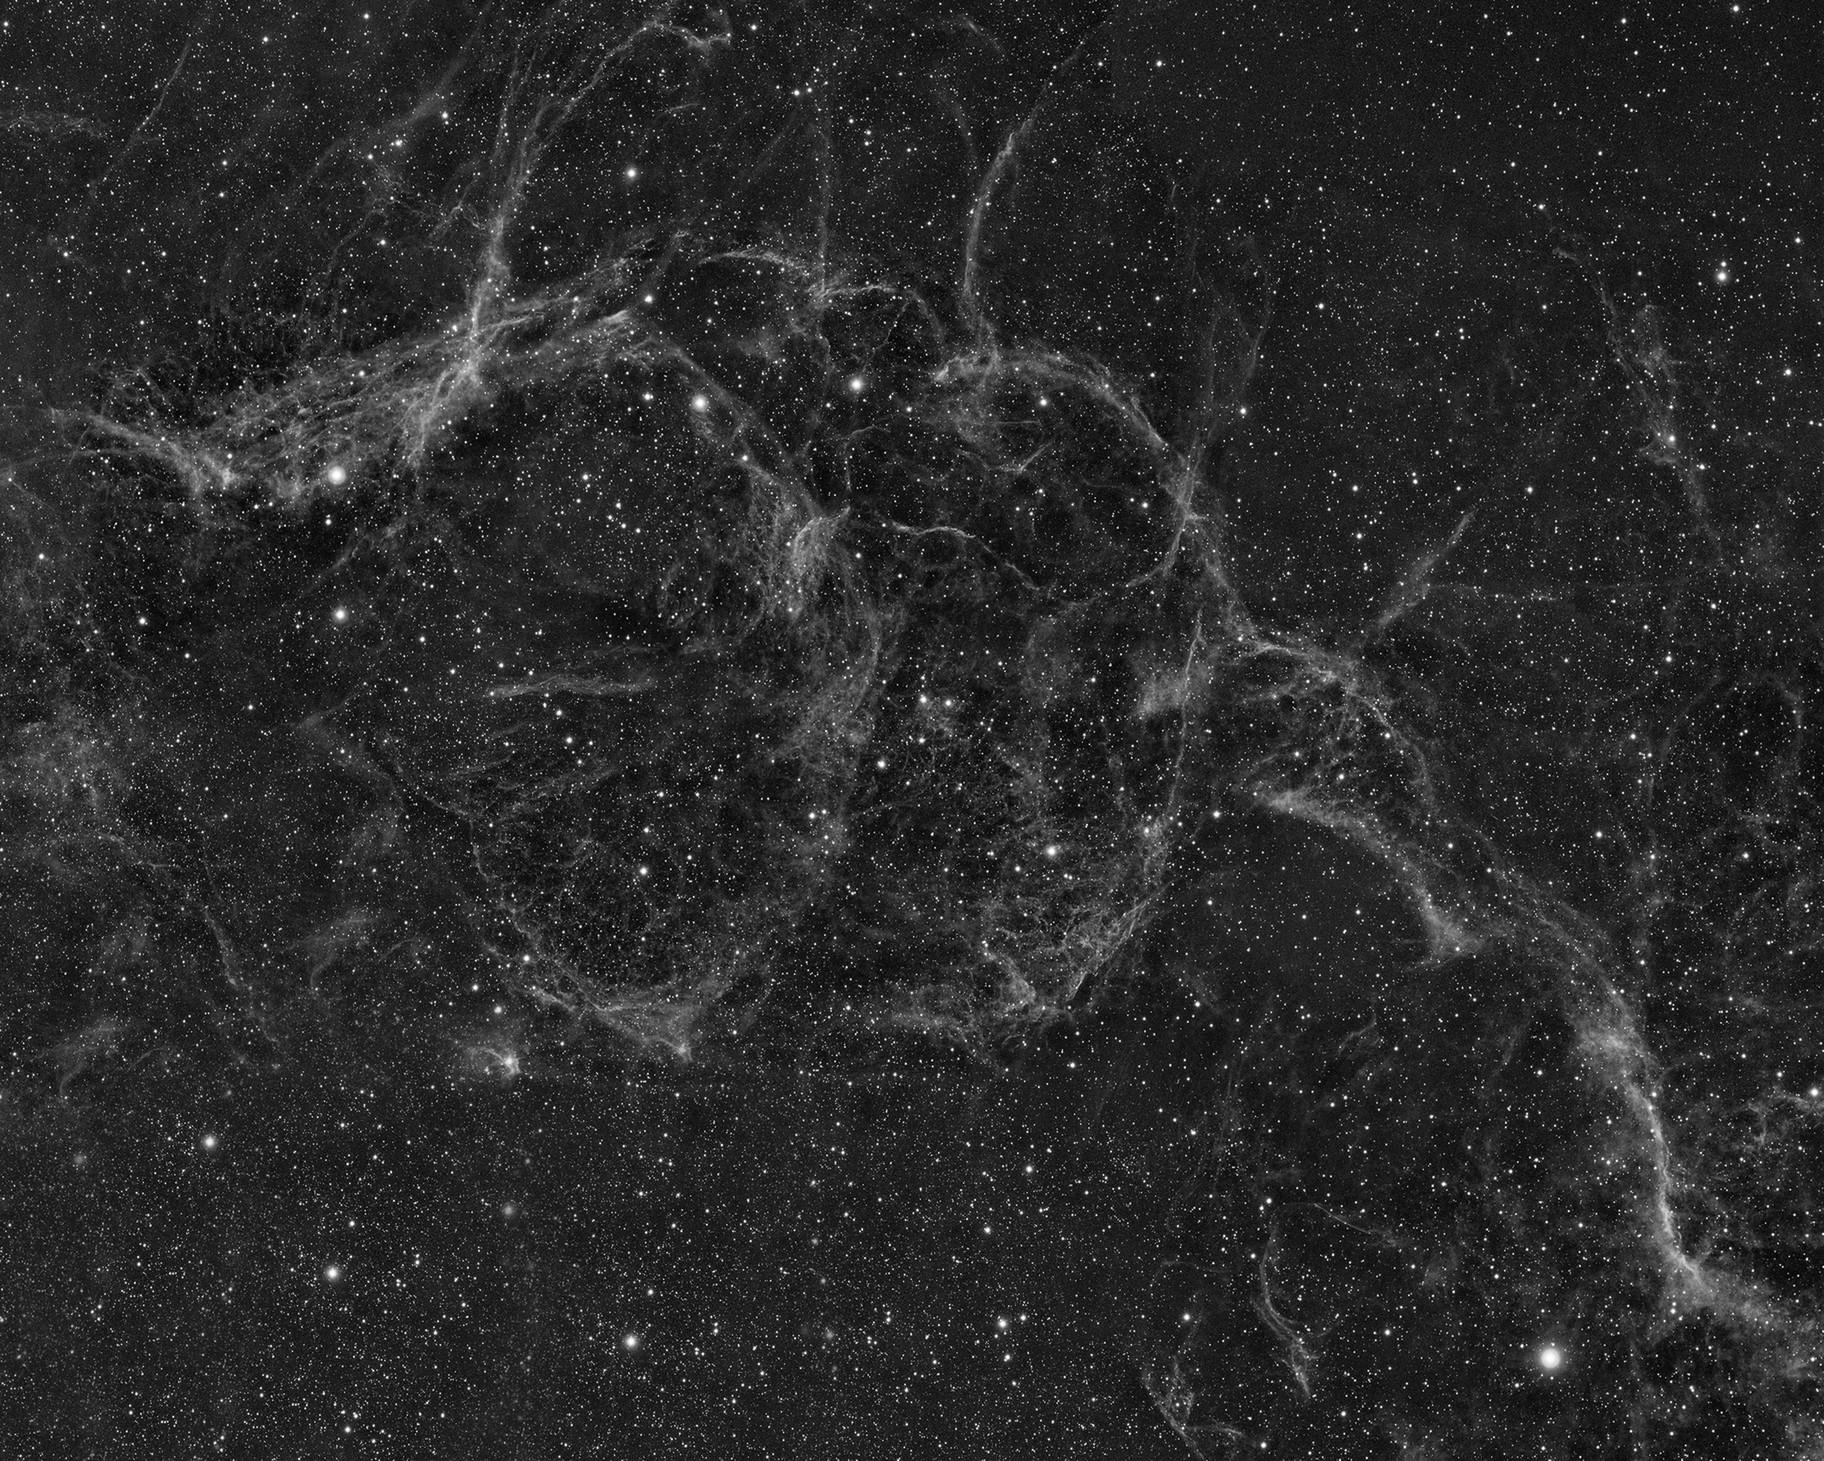 Vela Super Nova Remnant in OIII Wide Field Mosaic